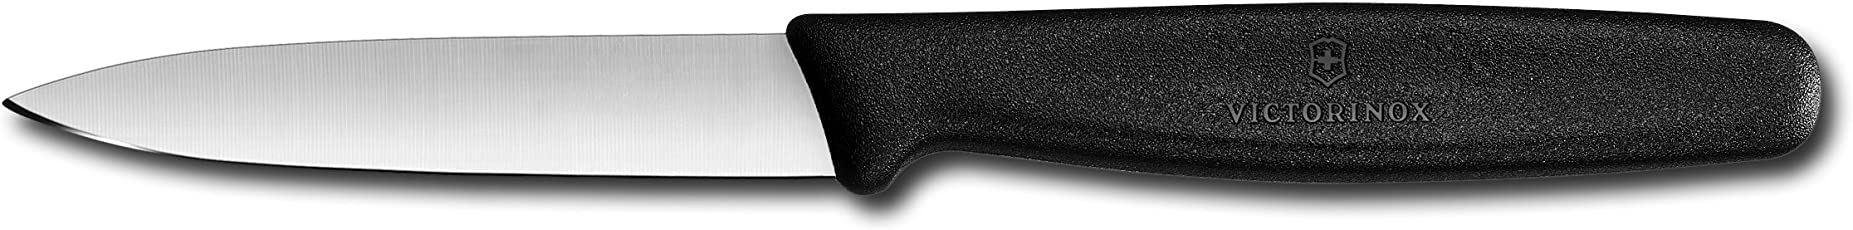 Victorinox Cutlery 3.25-Inch Paring Knife, Small Black Polypropylene Handle